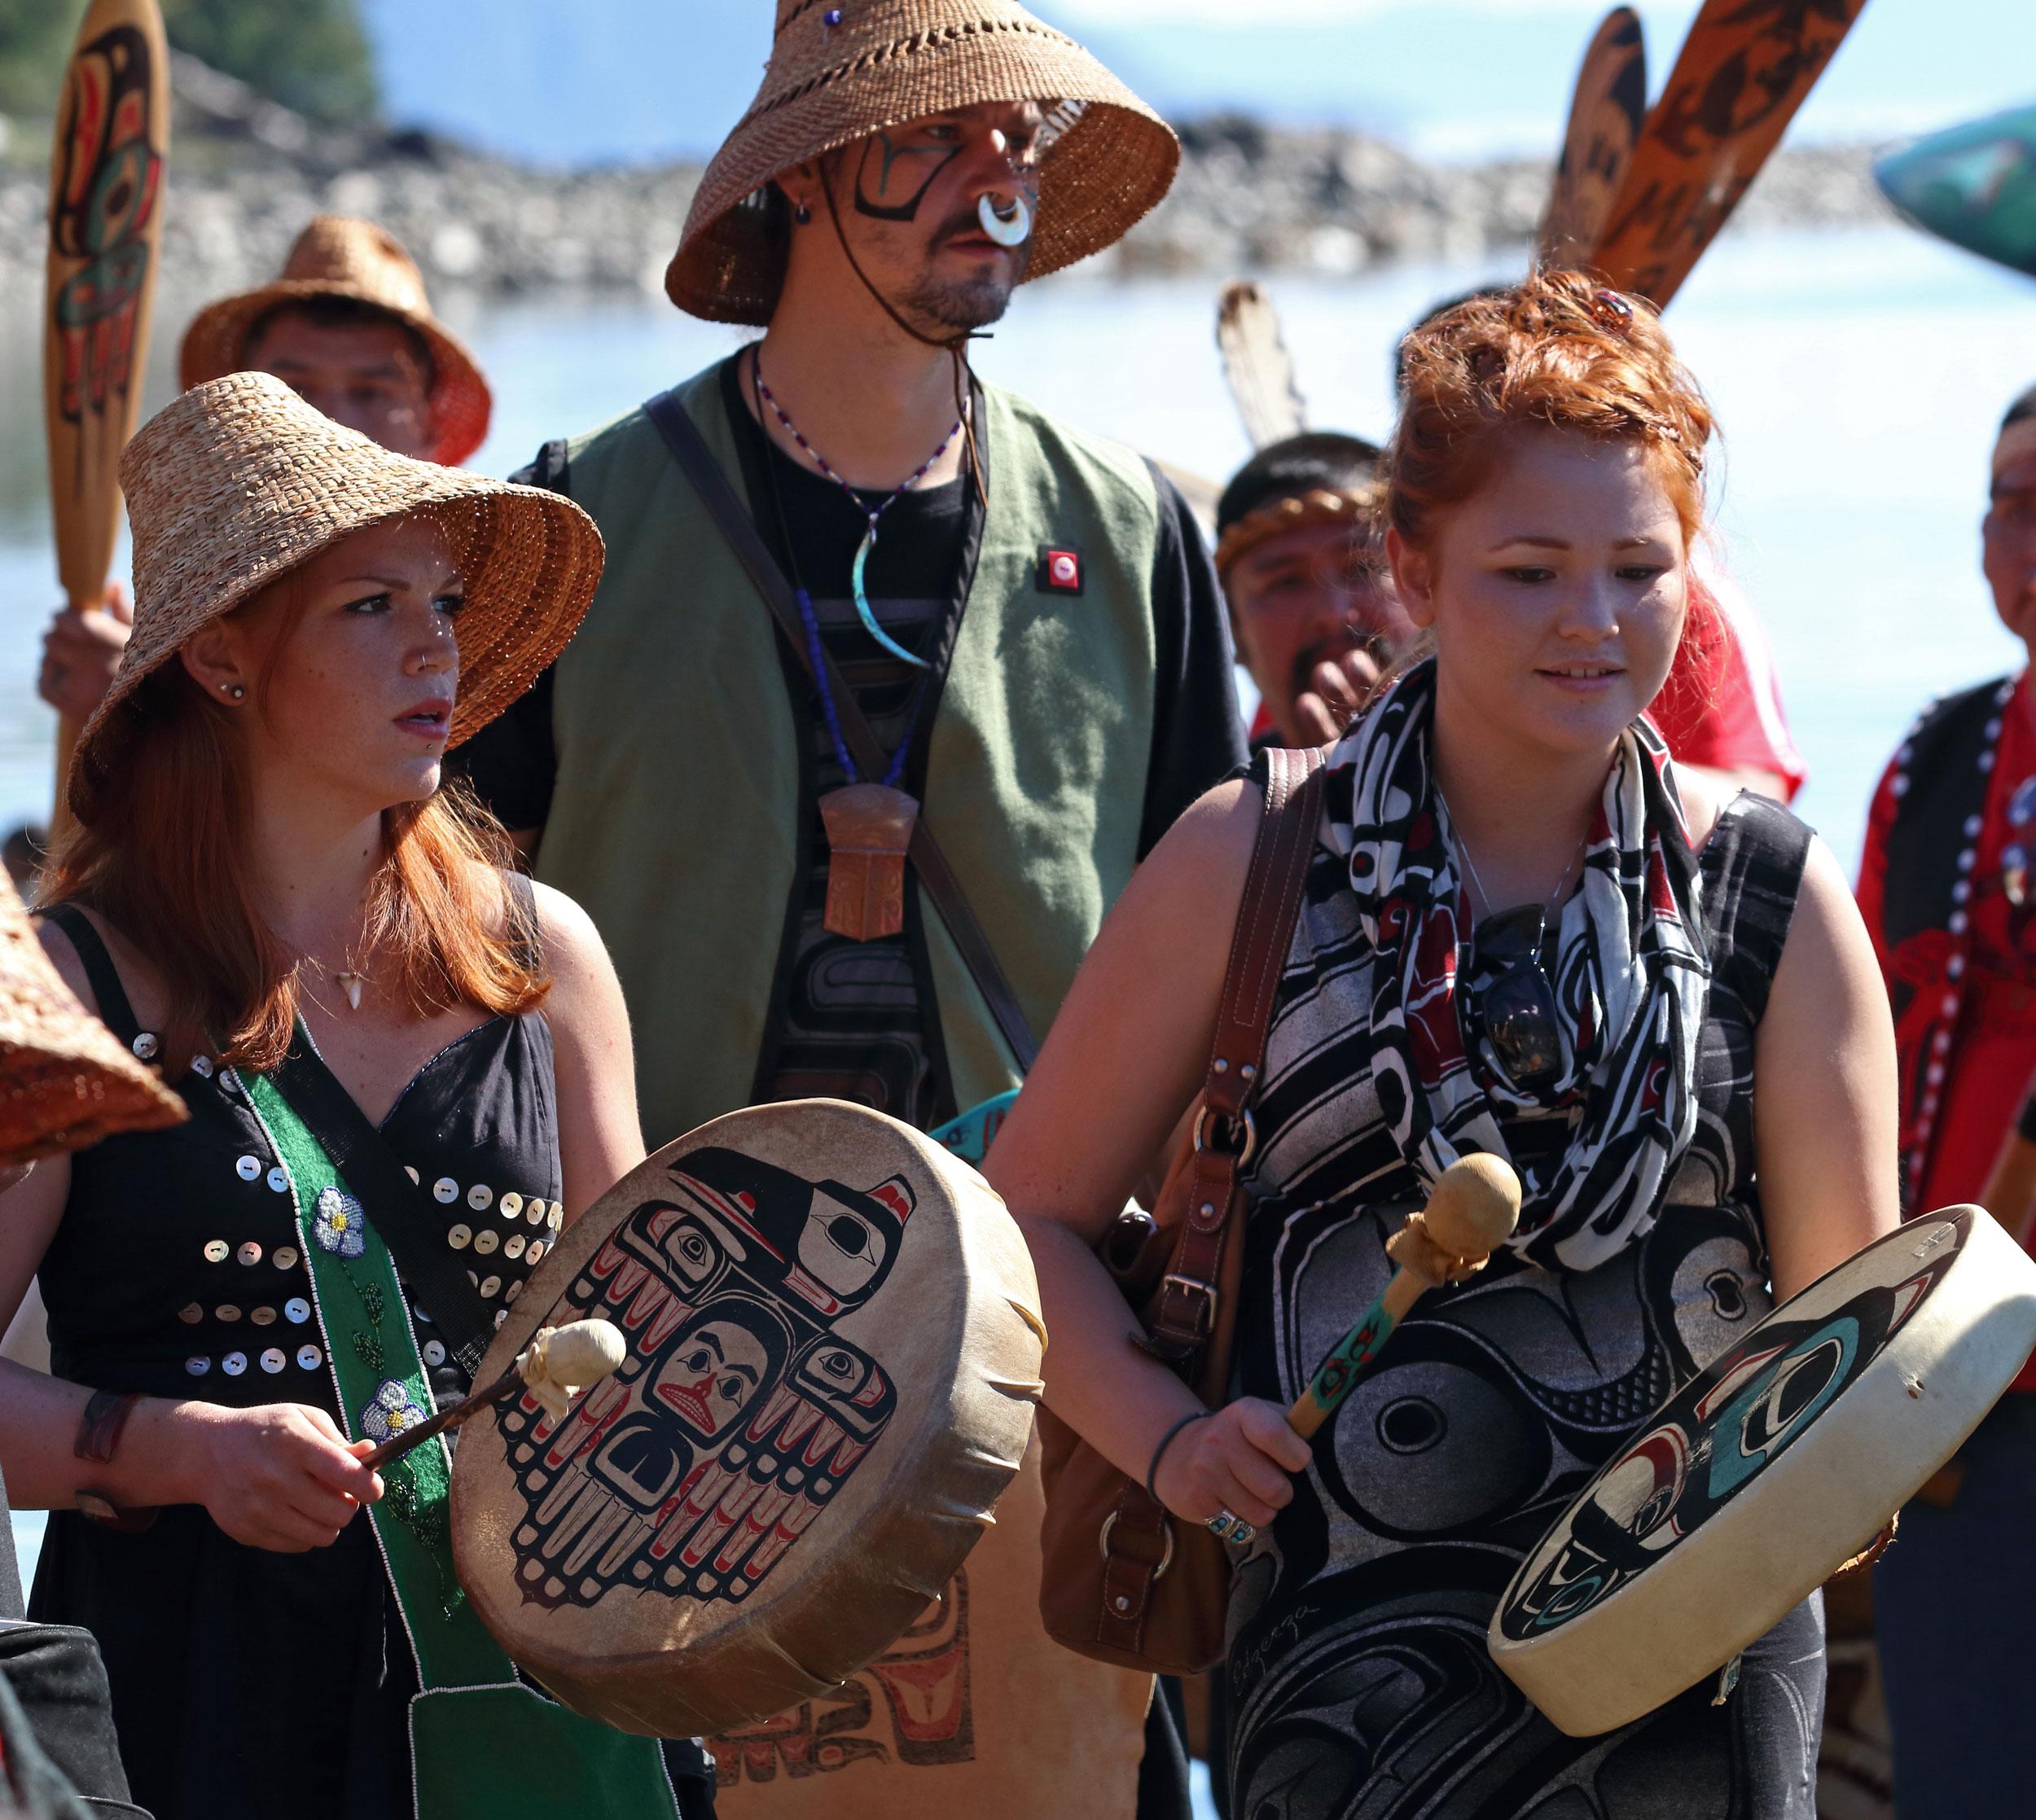 Alaska Native drummers celebrate the Chief Son-I-Hat longhouse in Kasaan Alaska